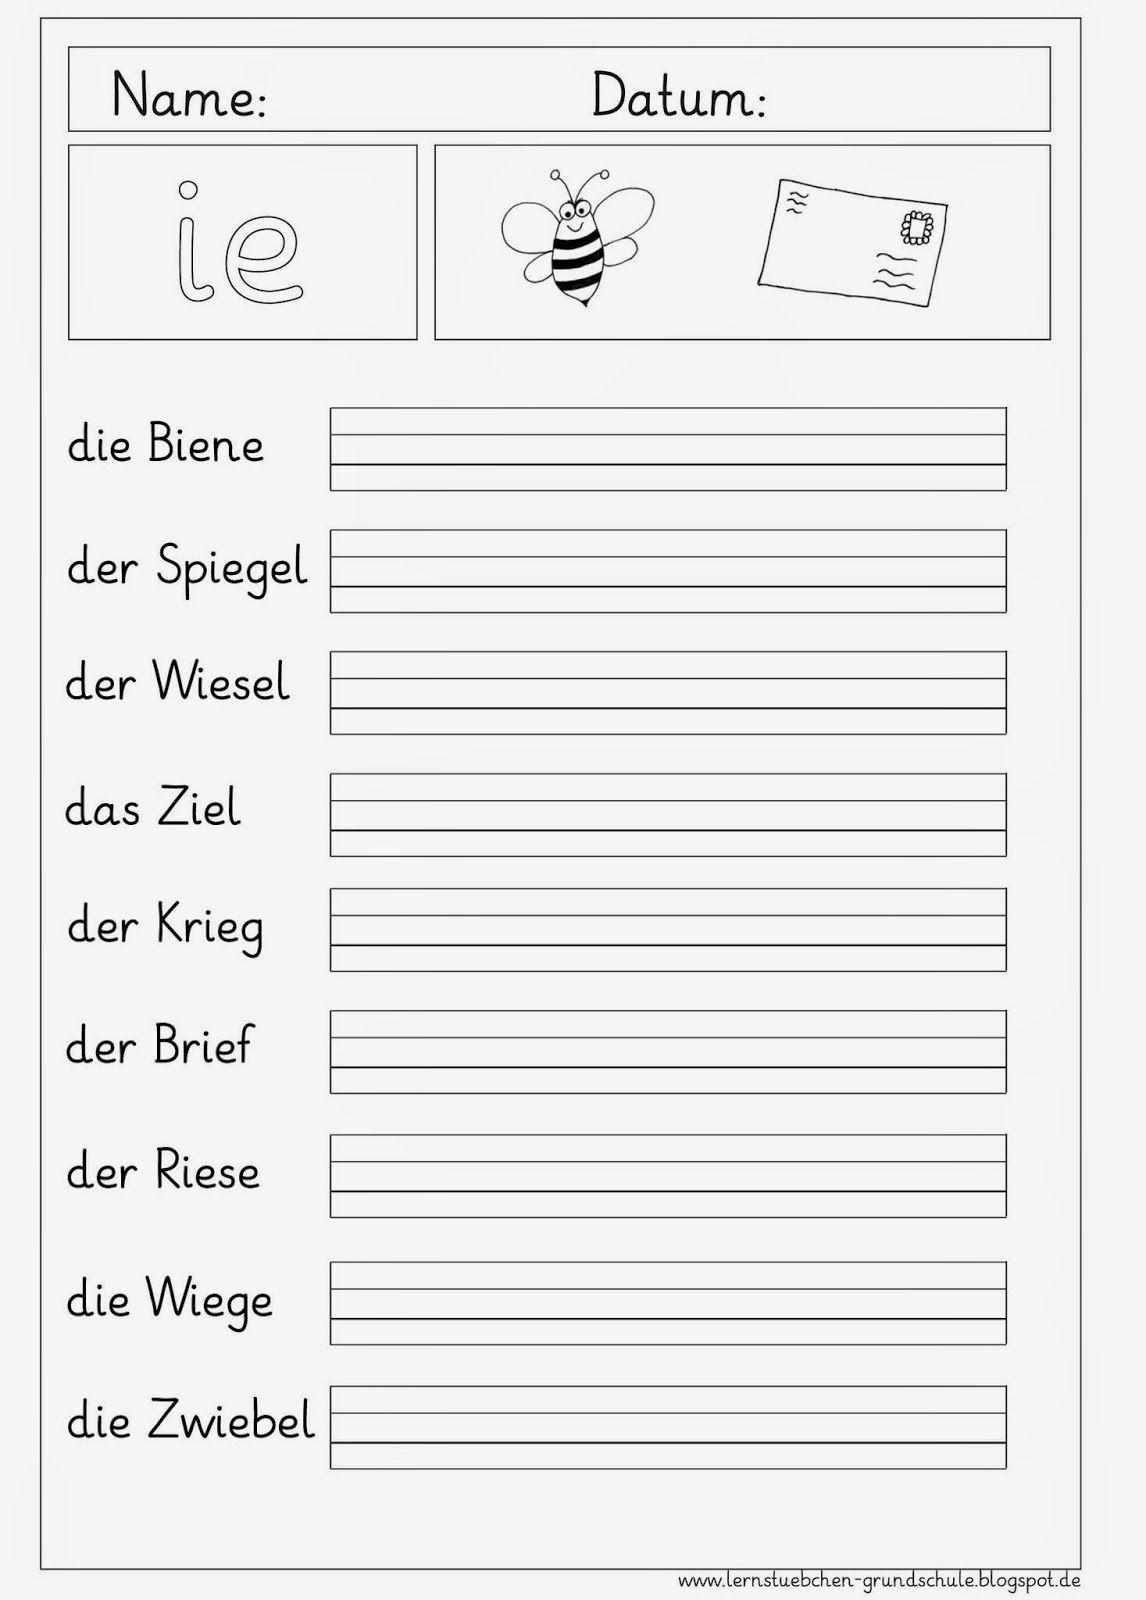 Arbeitsblätter Grundschule 1 Klasse Ausdrucken Lernstübchen bei 1 Klasse Arbeitsblätter Zum Ausdrucken